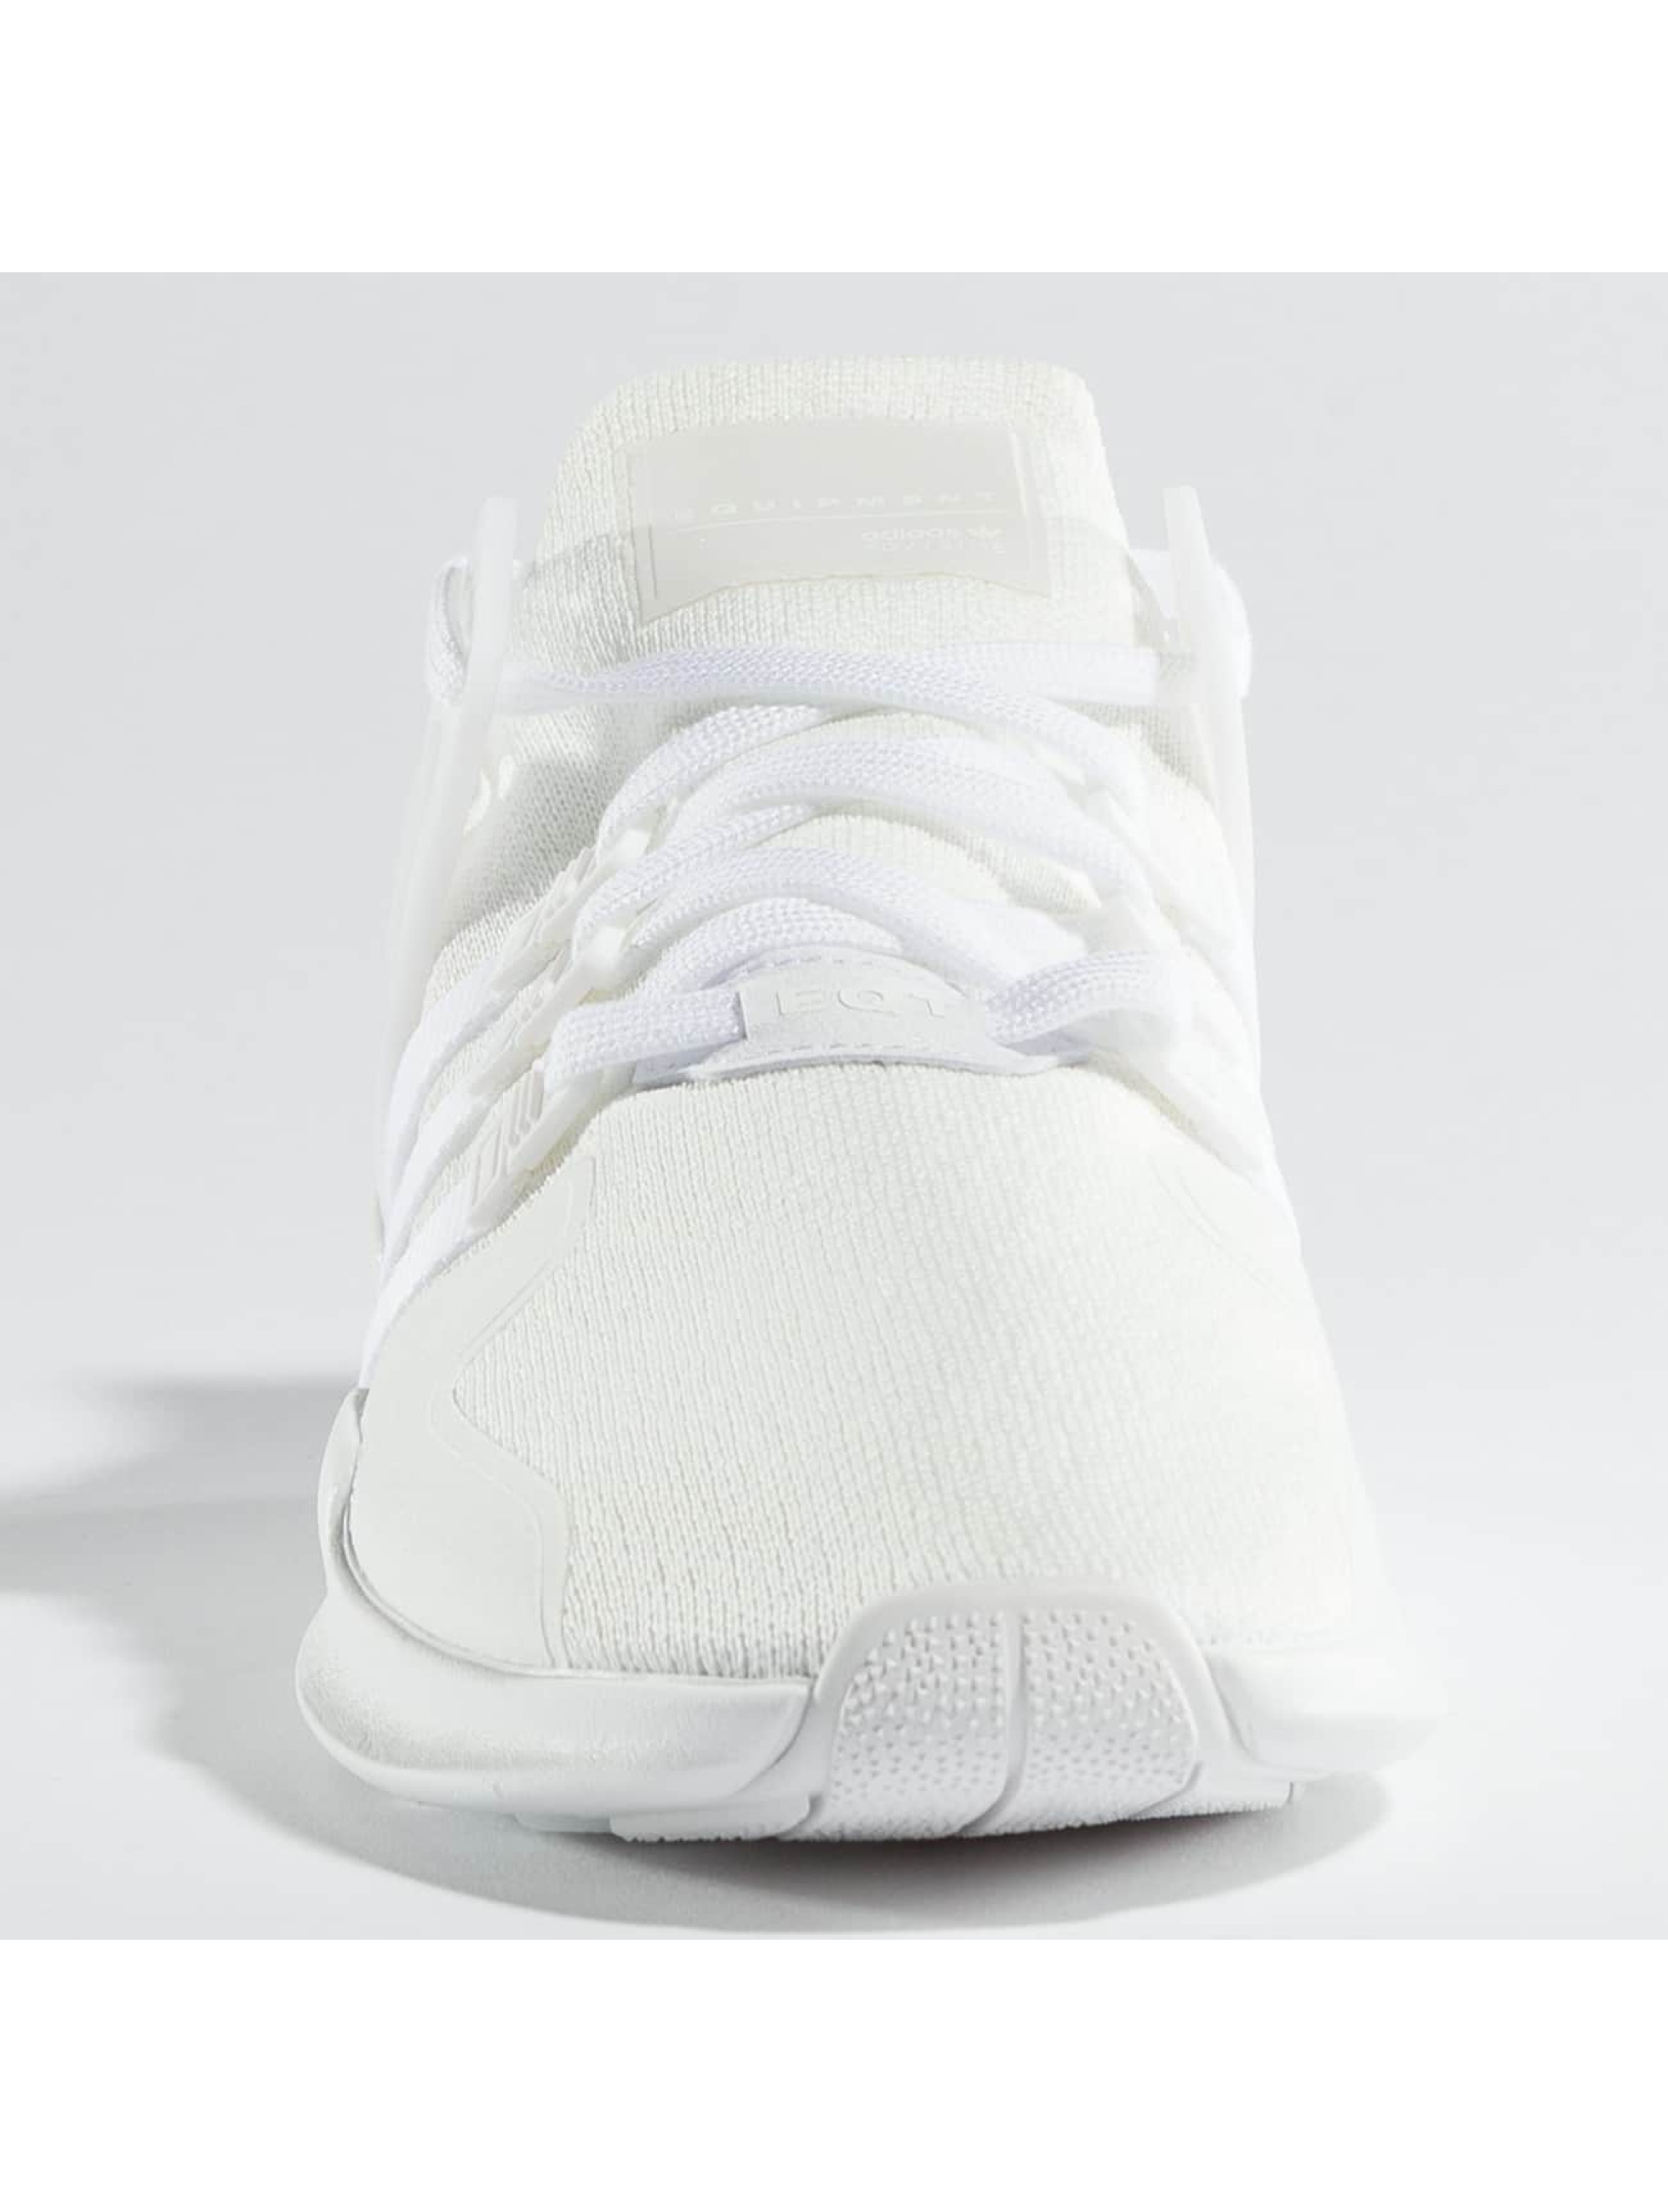 adidas Baskets Equipment Support ADV blanc